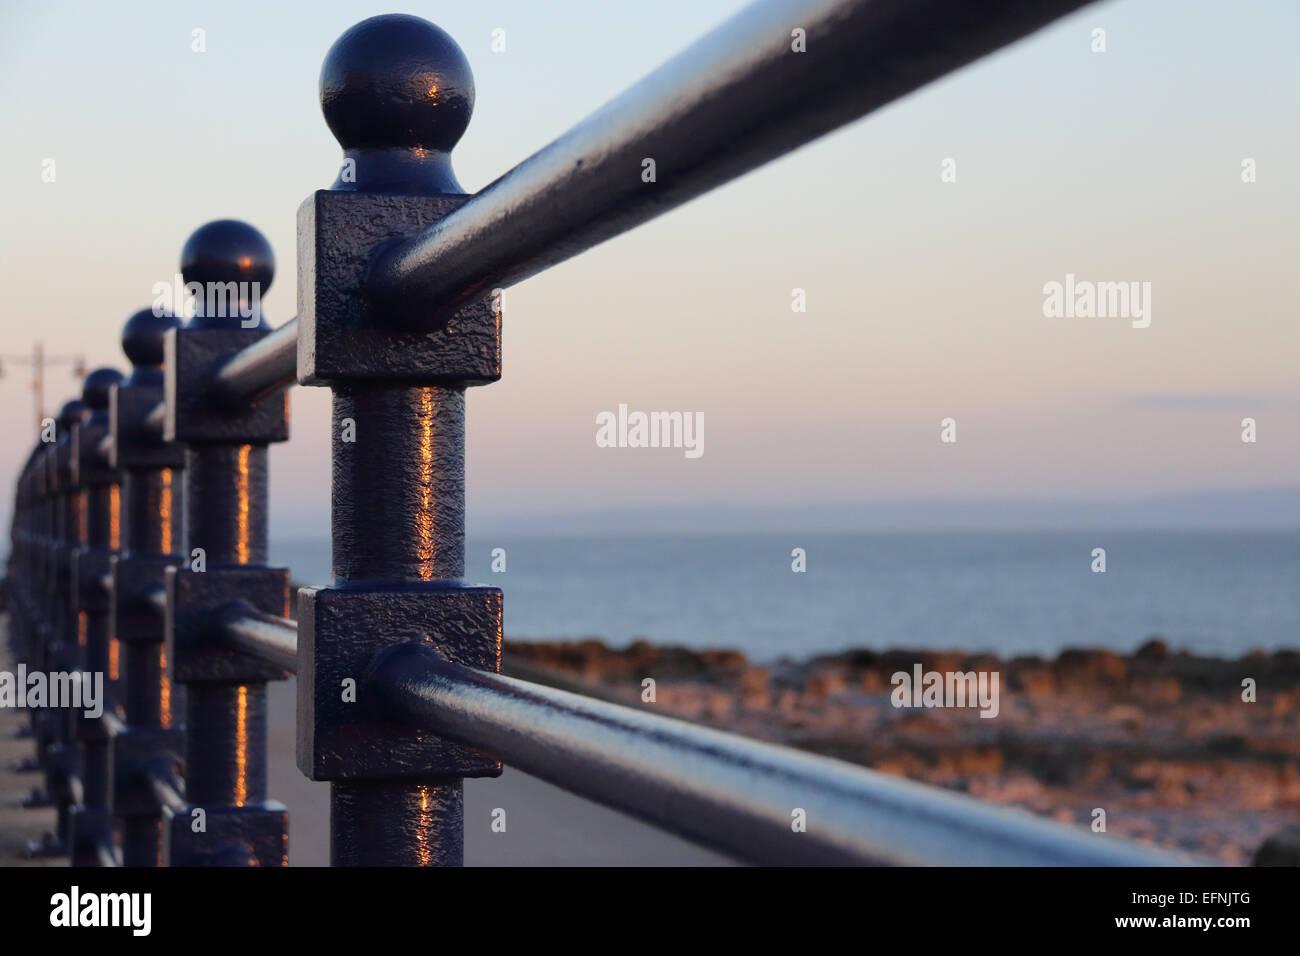 Blue cast iron railings on seaside promenade - Stock Image